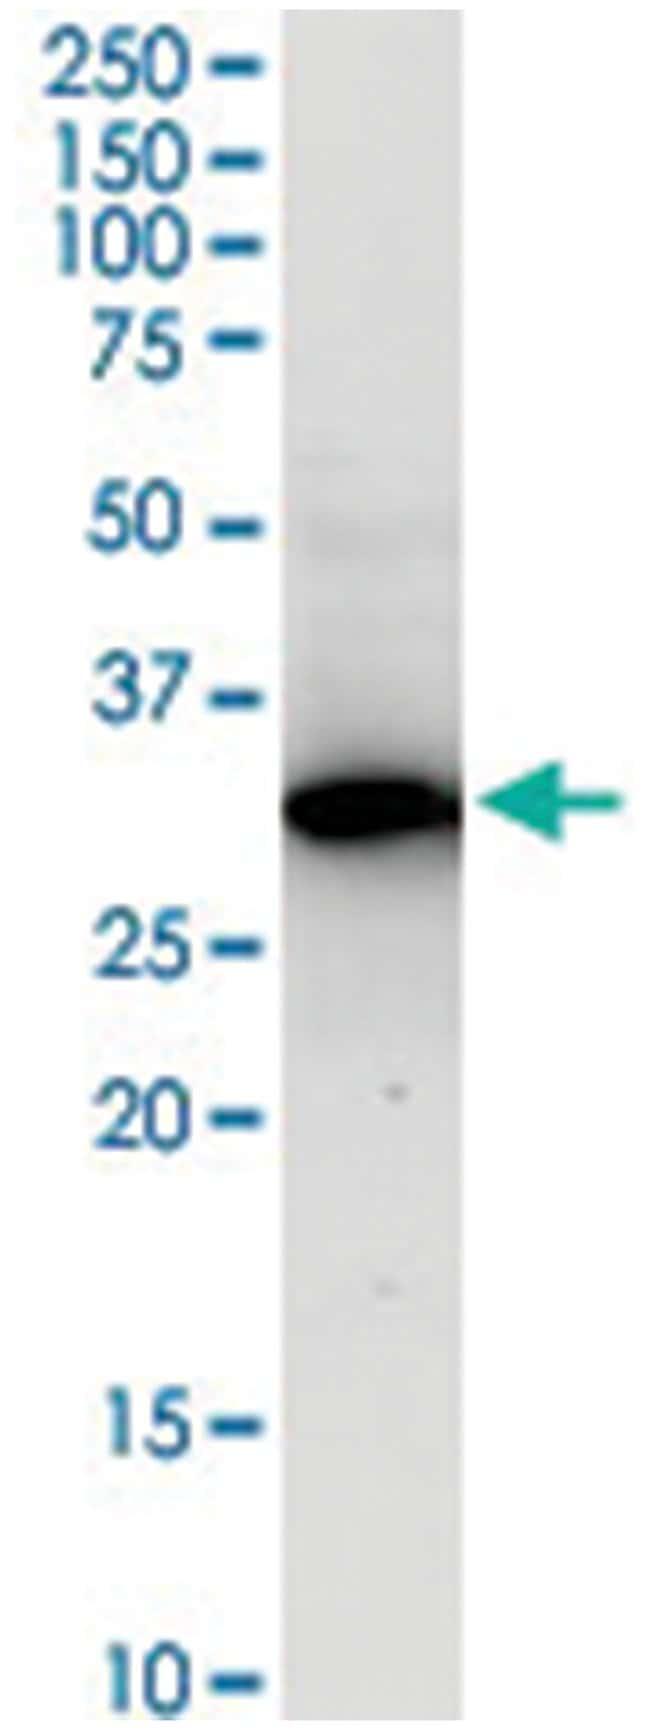 anti-RPRD1A, Human, IP-WB Antibody Pair, Abnova 1 Set:Antibodies